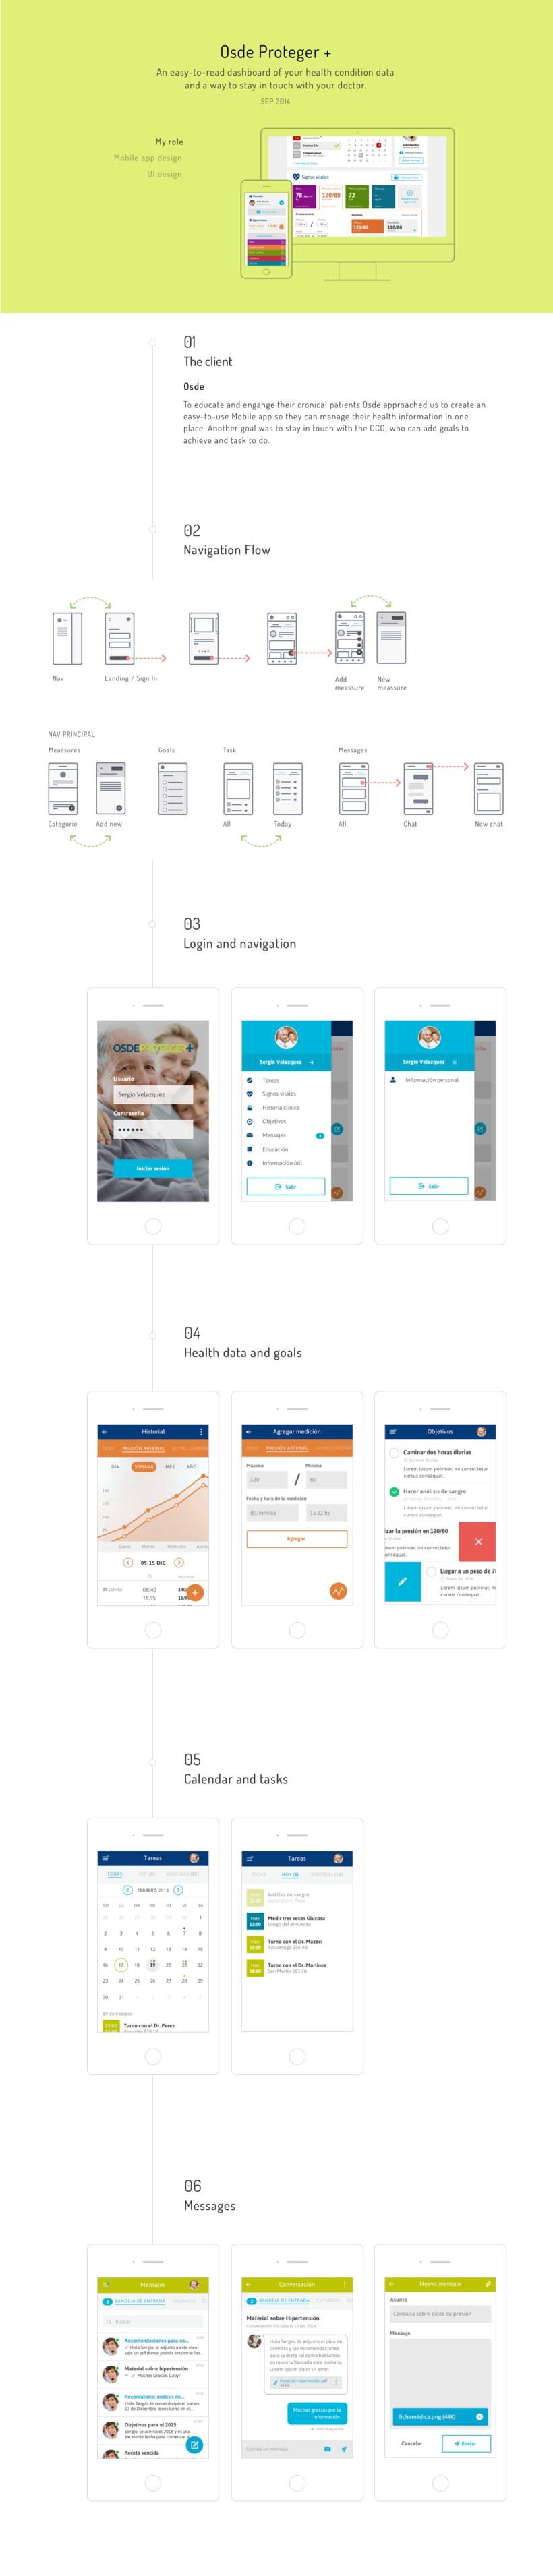 app | osde proteger + 0